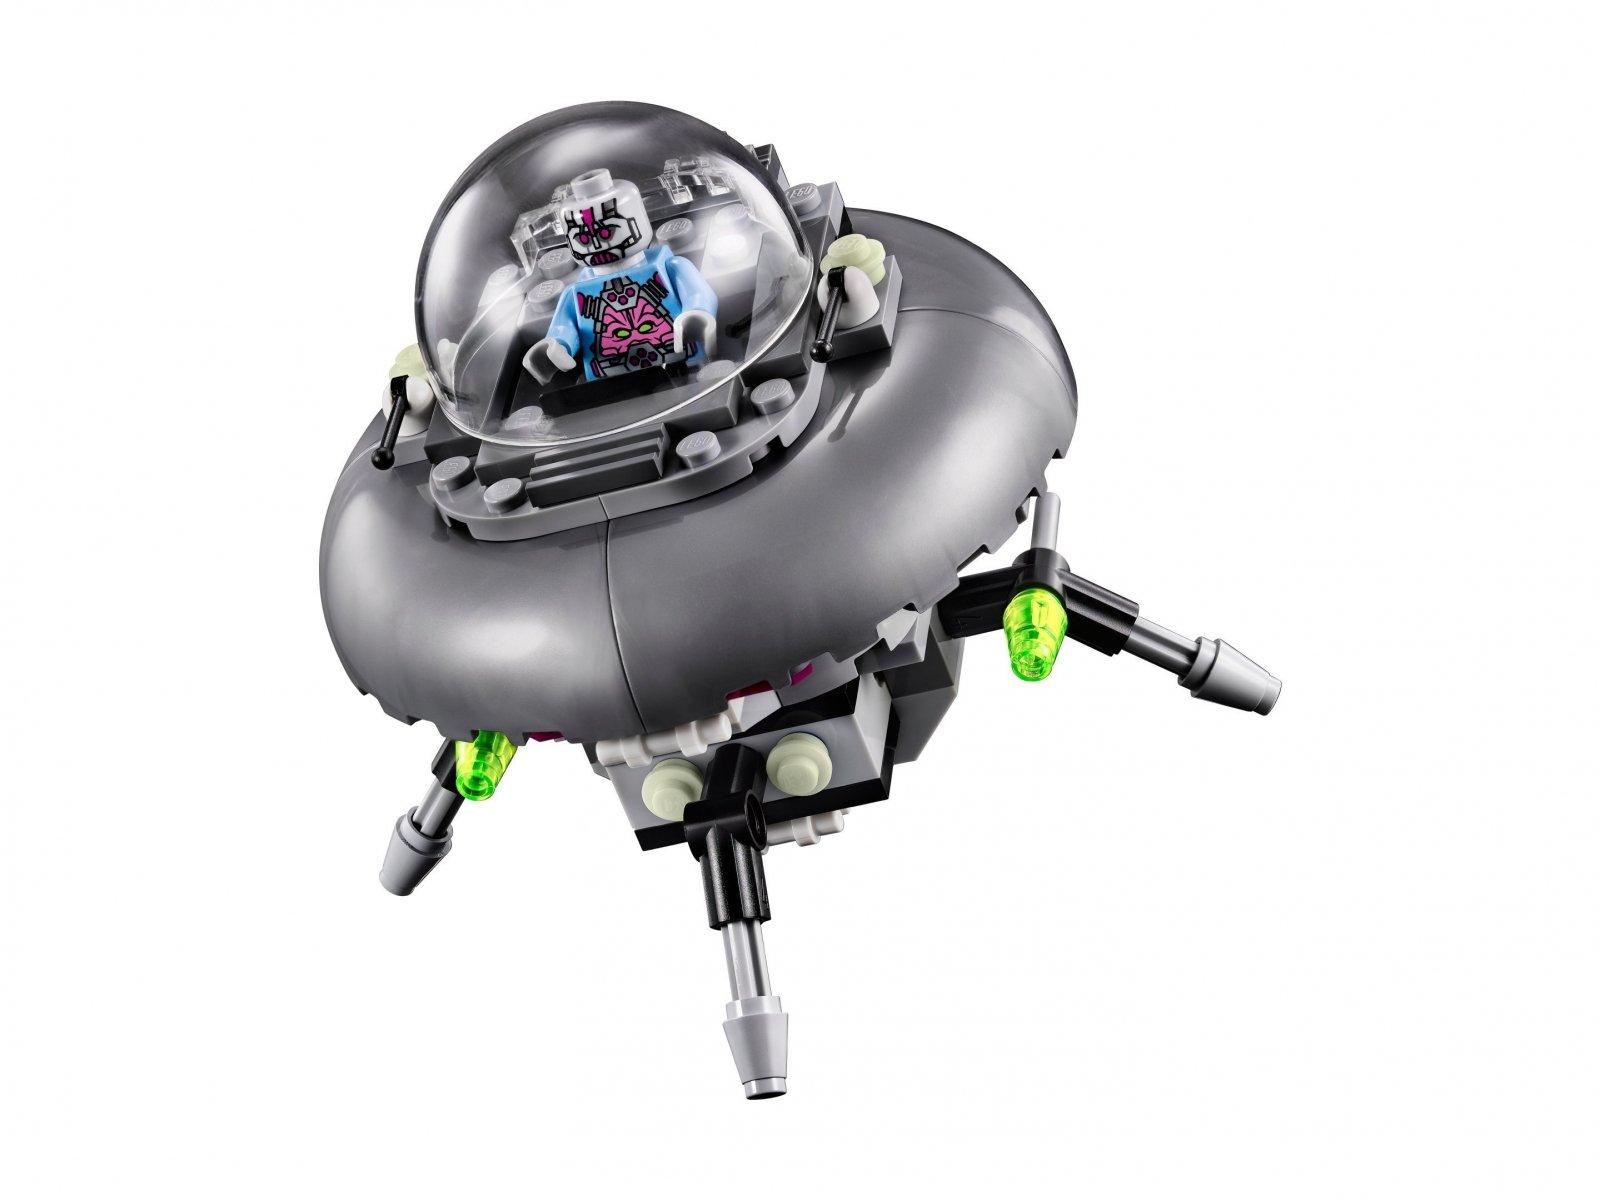 LEGO 79120 Teenage Mutant Ninja Turtles™ Podniebne uderzenie